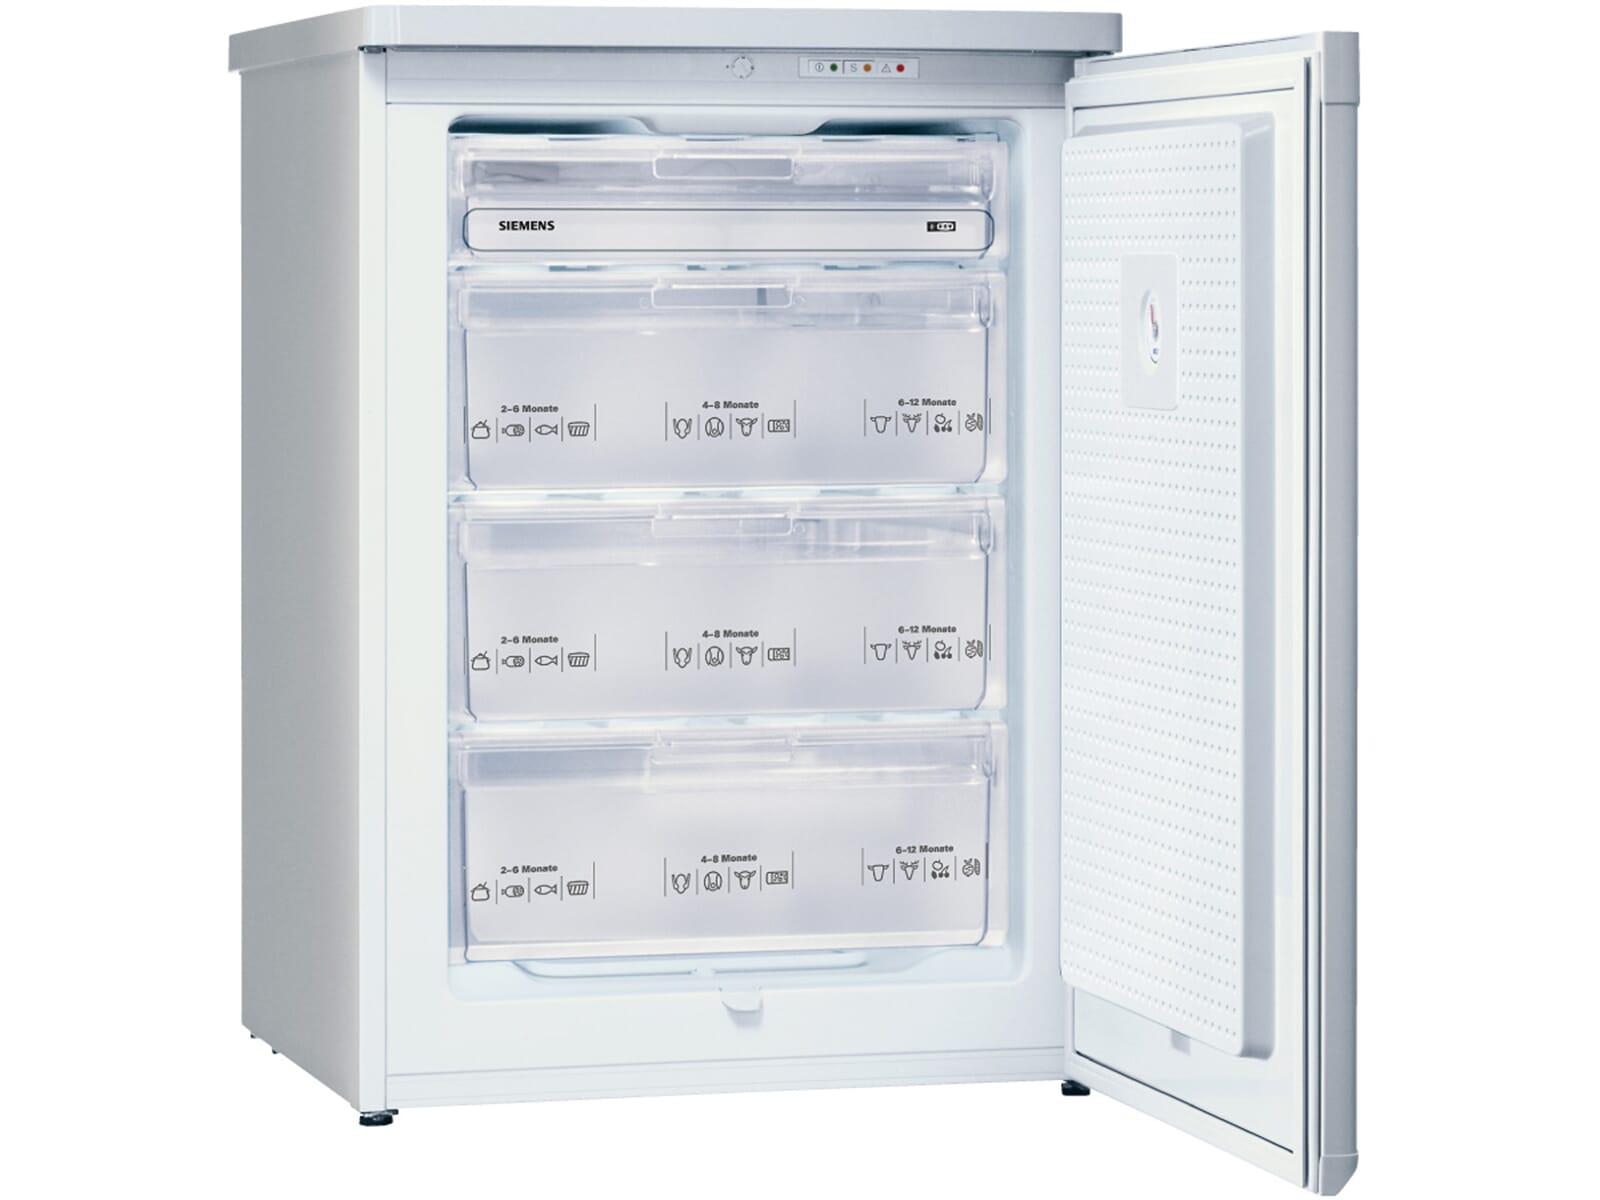 Amica Uks16158 Kühlschrank : Amica kühlschrank uks profi cook pc gk glaskühlschrank eek